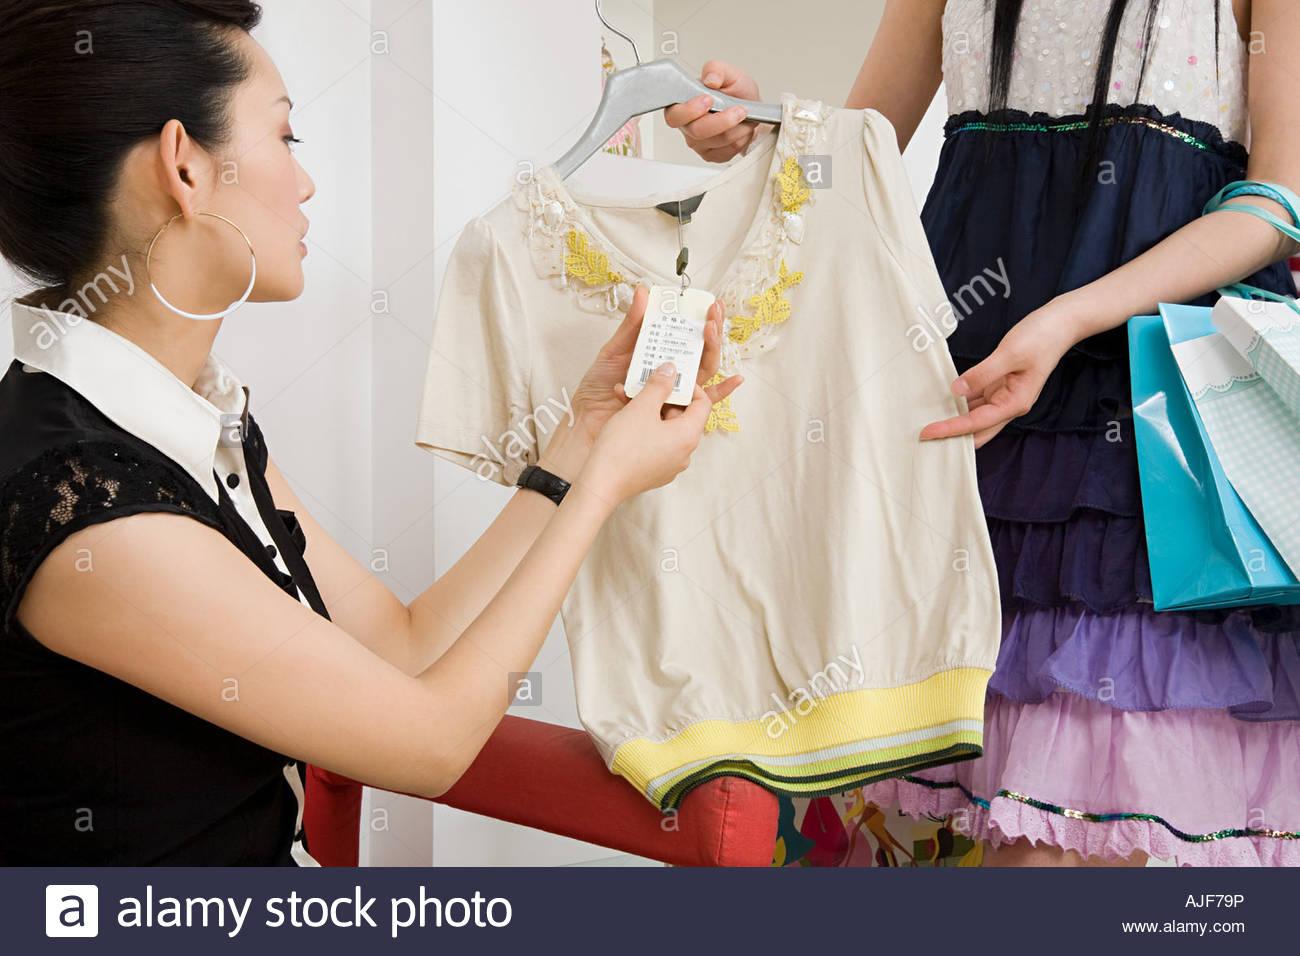 3dfe3ea8f Ladies Clothes Shop Interior Stock Photos & Ladies Clothes Shop ...